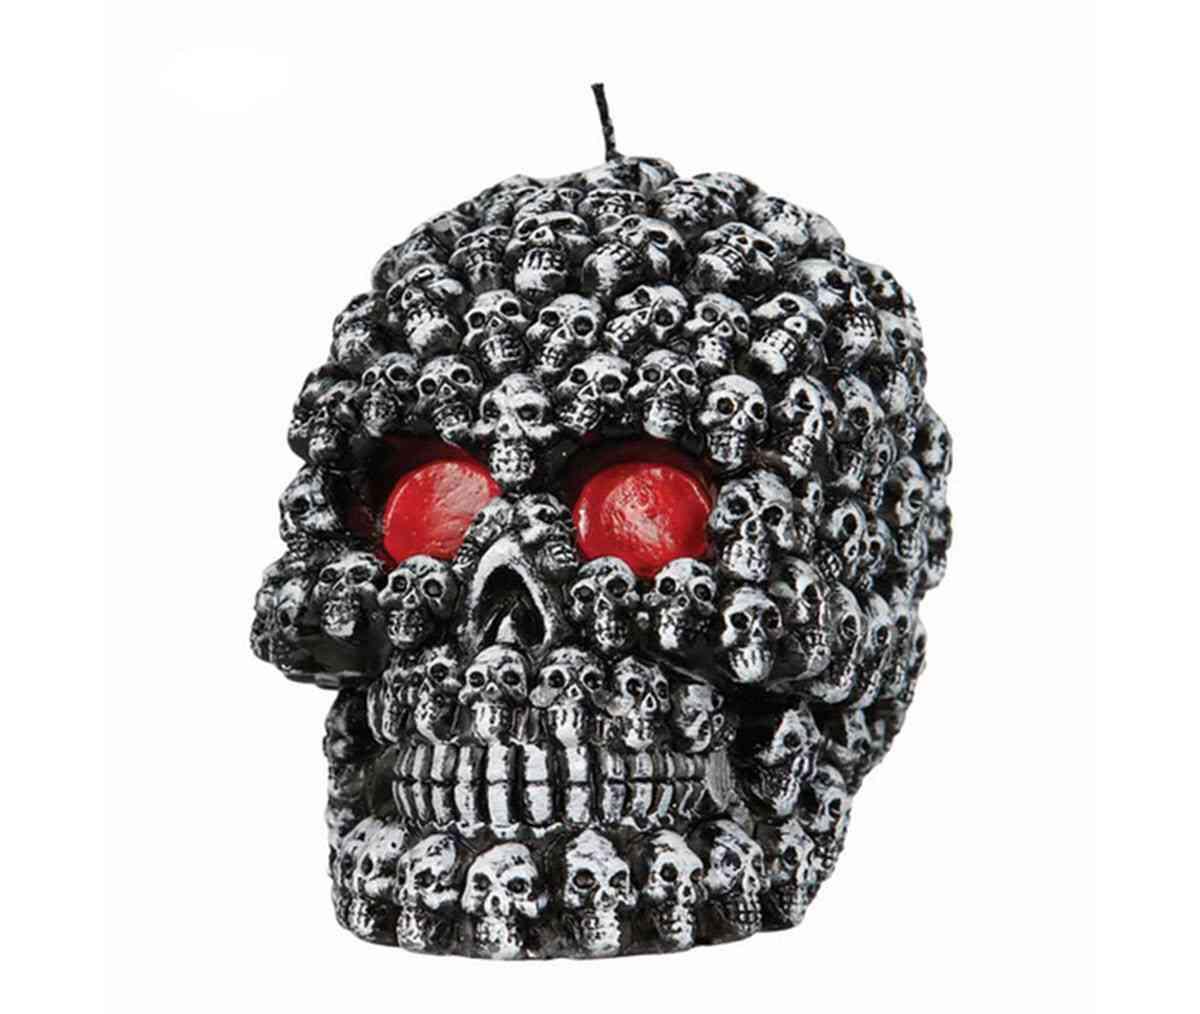 objetos de decoración para Halloween